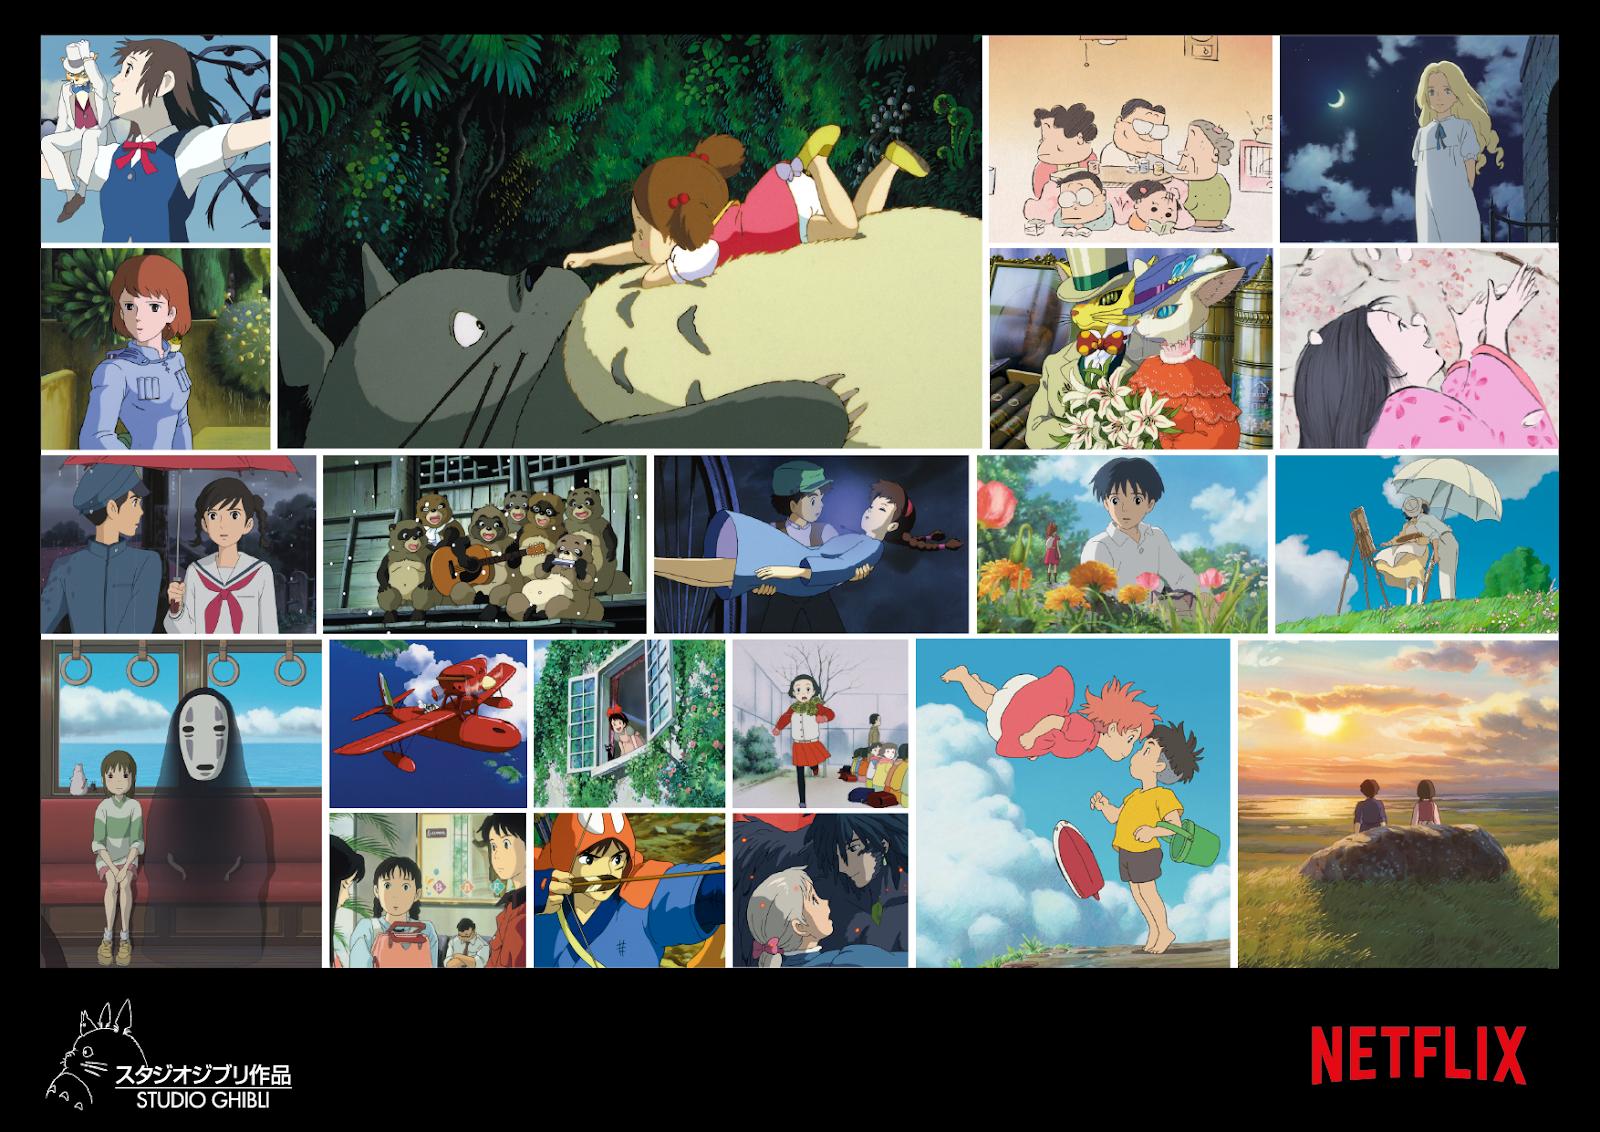 Studio Ghibli - Netflix